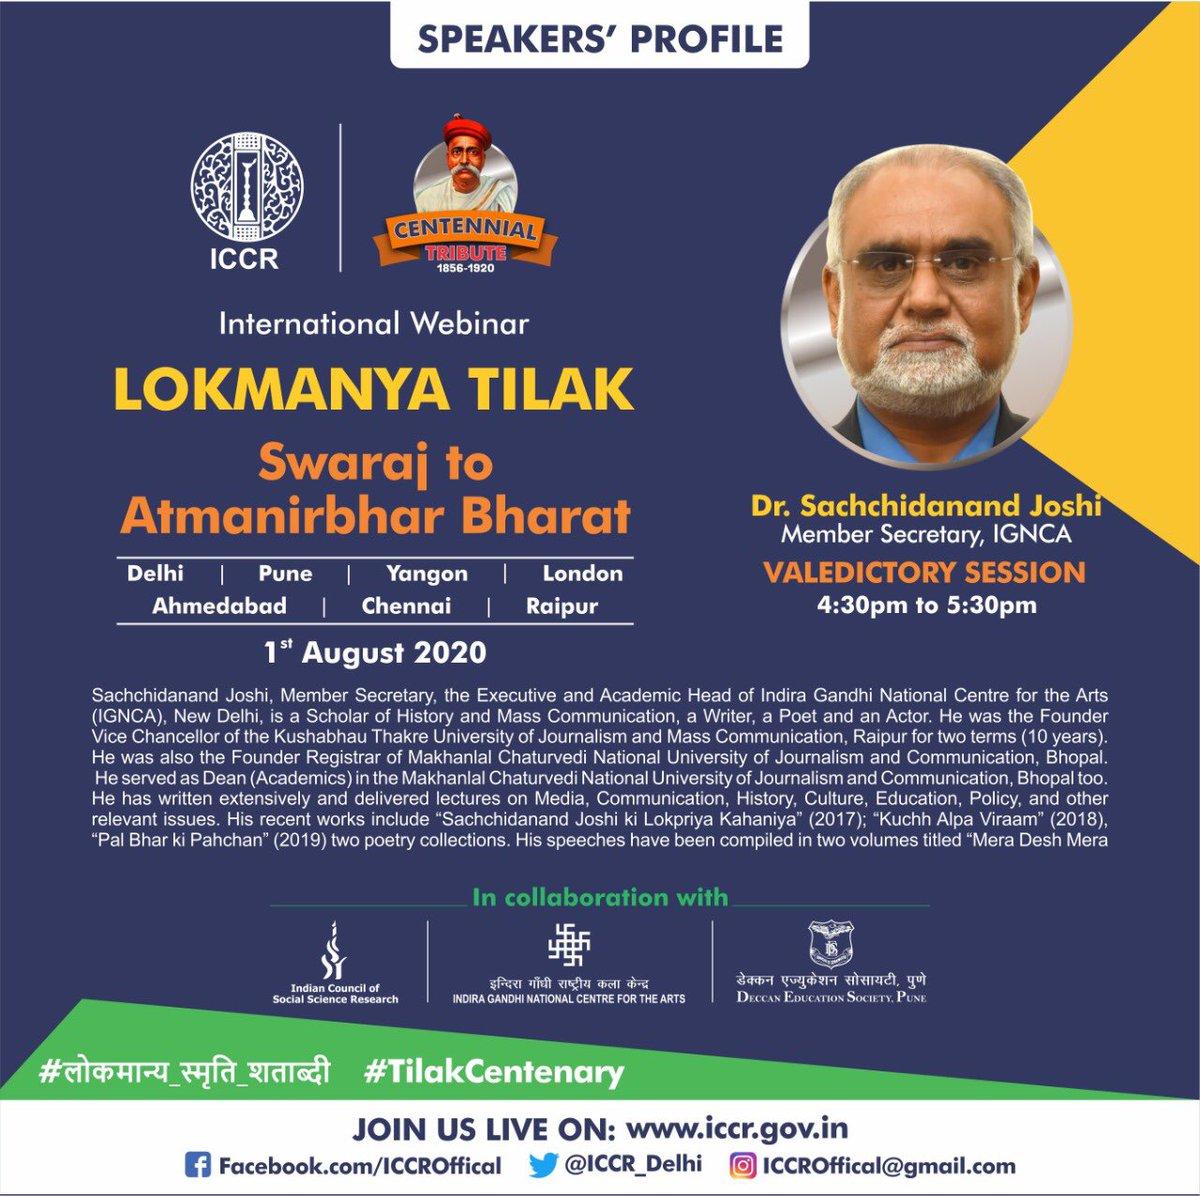 "Renowned scholar Dr Sachchidanand Joshi of @ignca_delhi will address Valedictory Session of Intl' Webinar ""Lokmanya Tilak: Swaraj to Atmanirbhar Bharat"". Join Us! #लोकमान्य_स्मृति_शताब्दी #TilakCentenary"